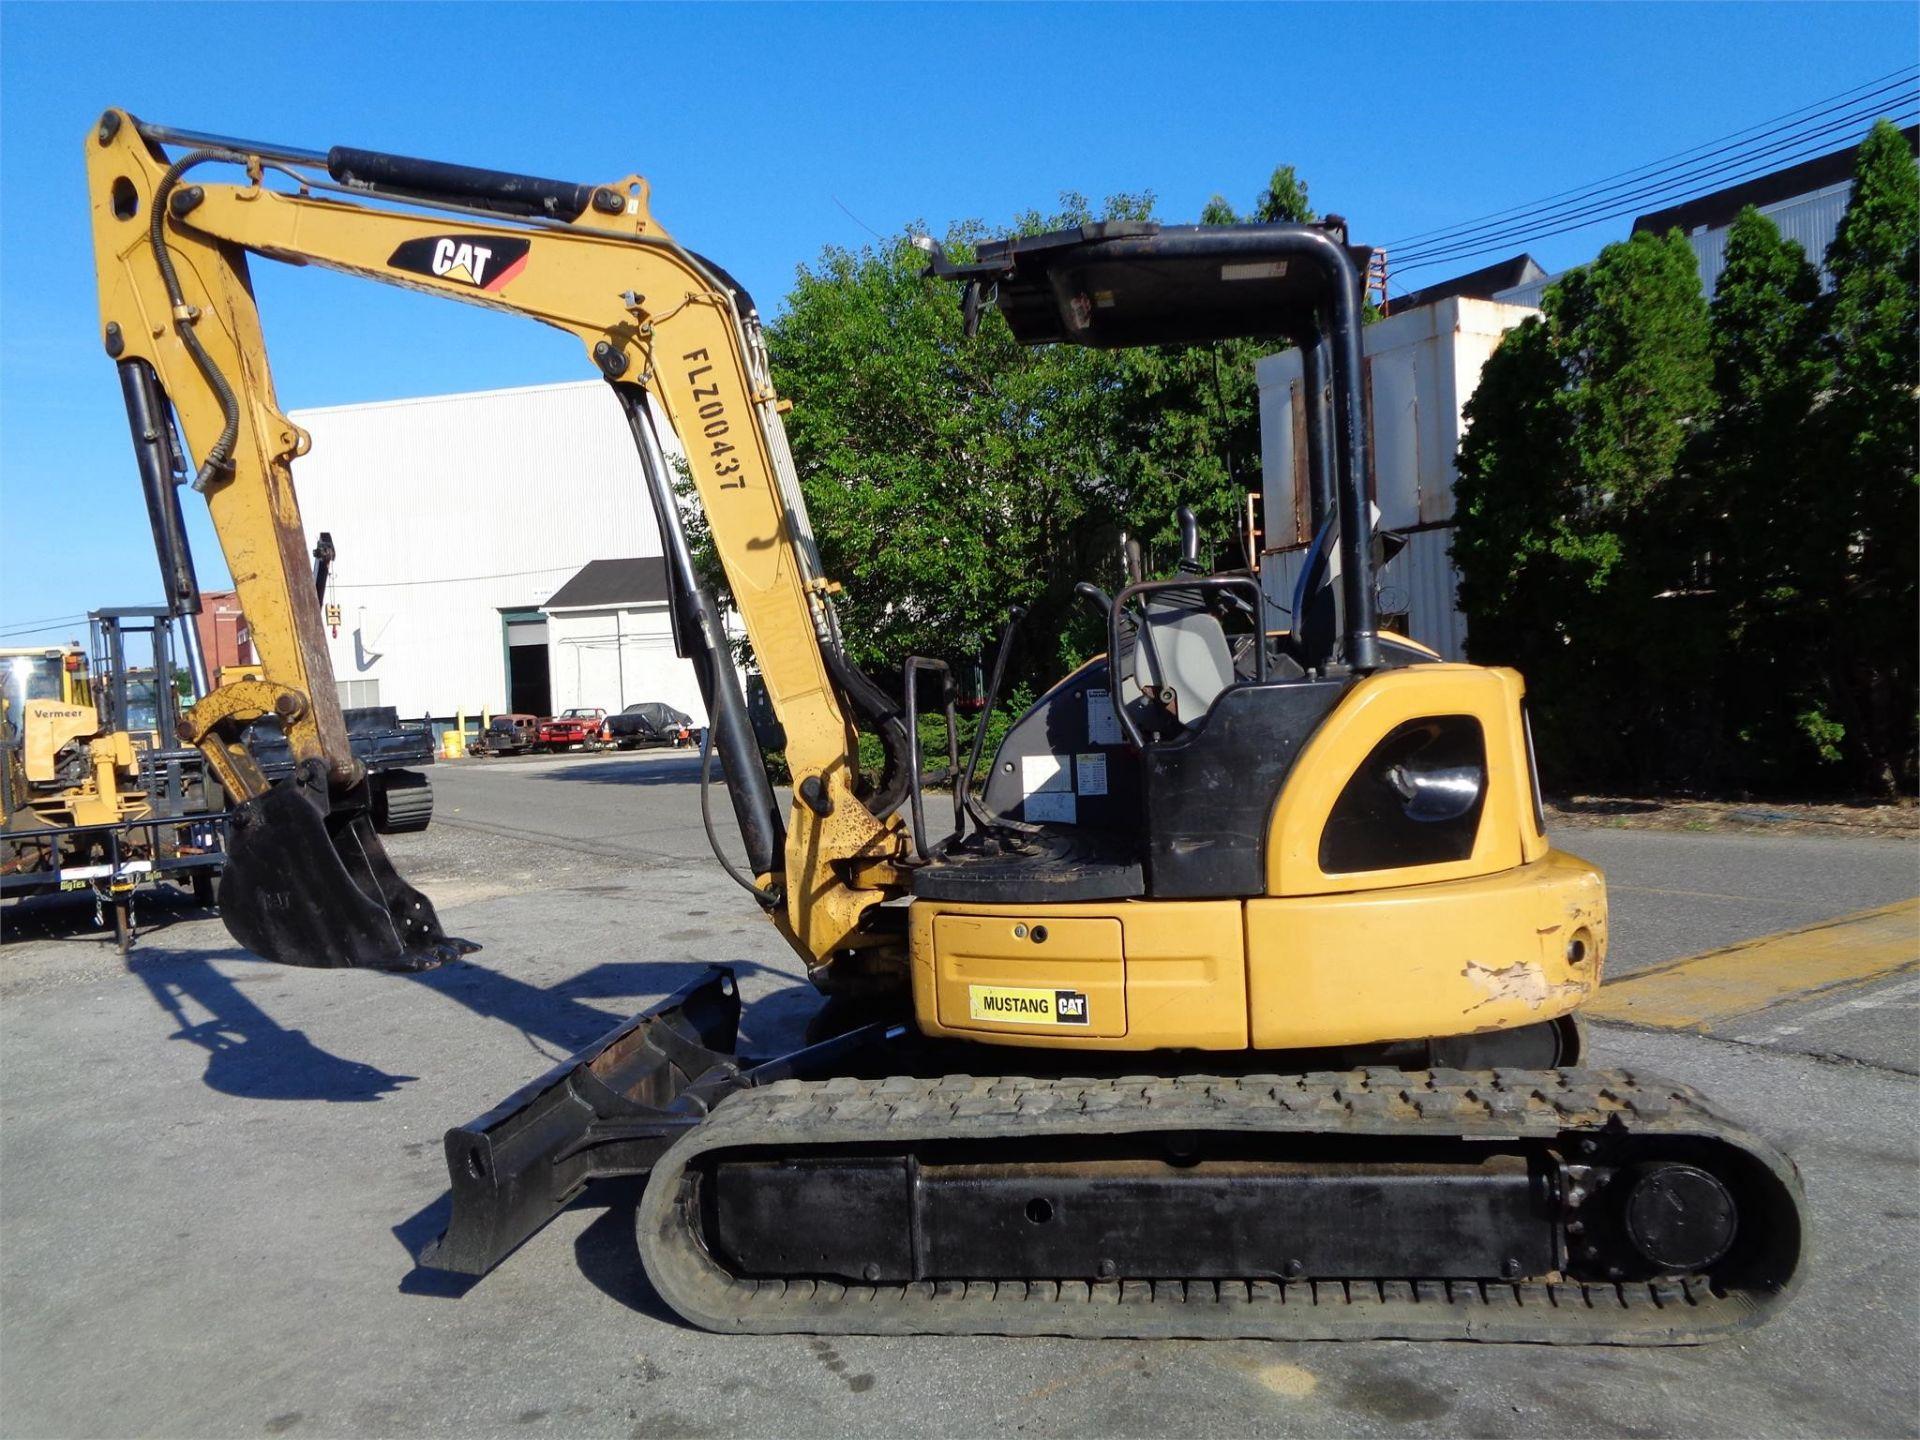 Lot 24 - 2011 Caterpillar 305.5D CR Mini Hydraulic Excavator